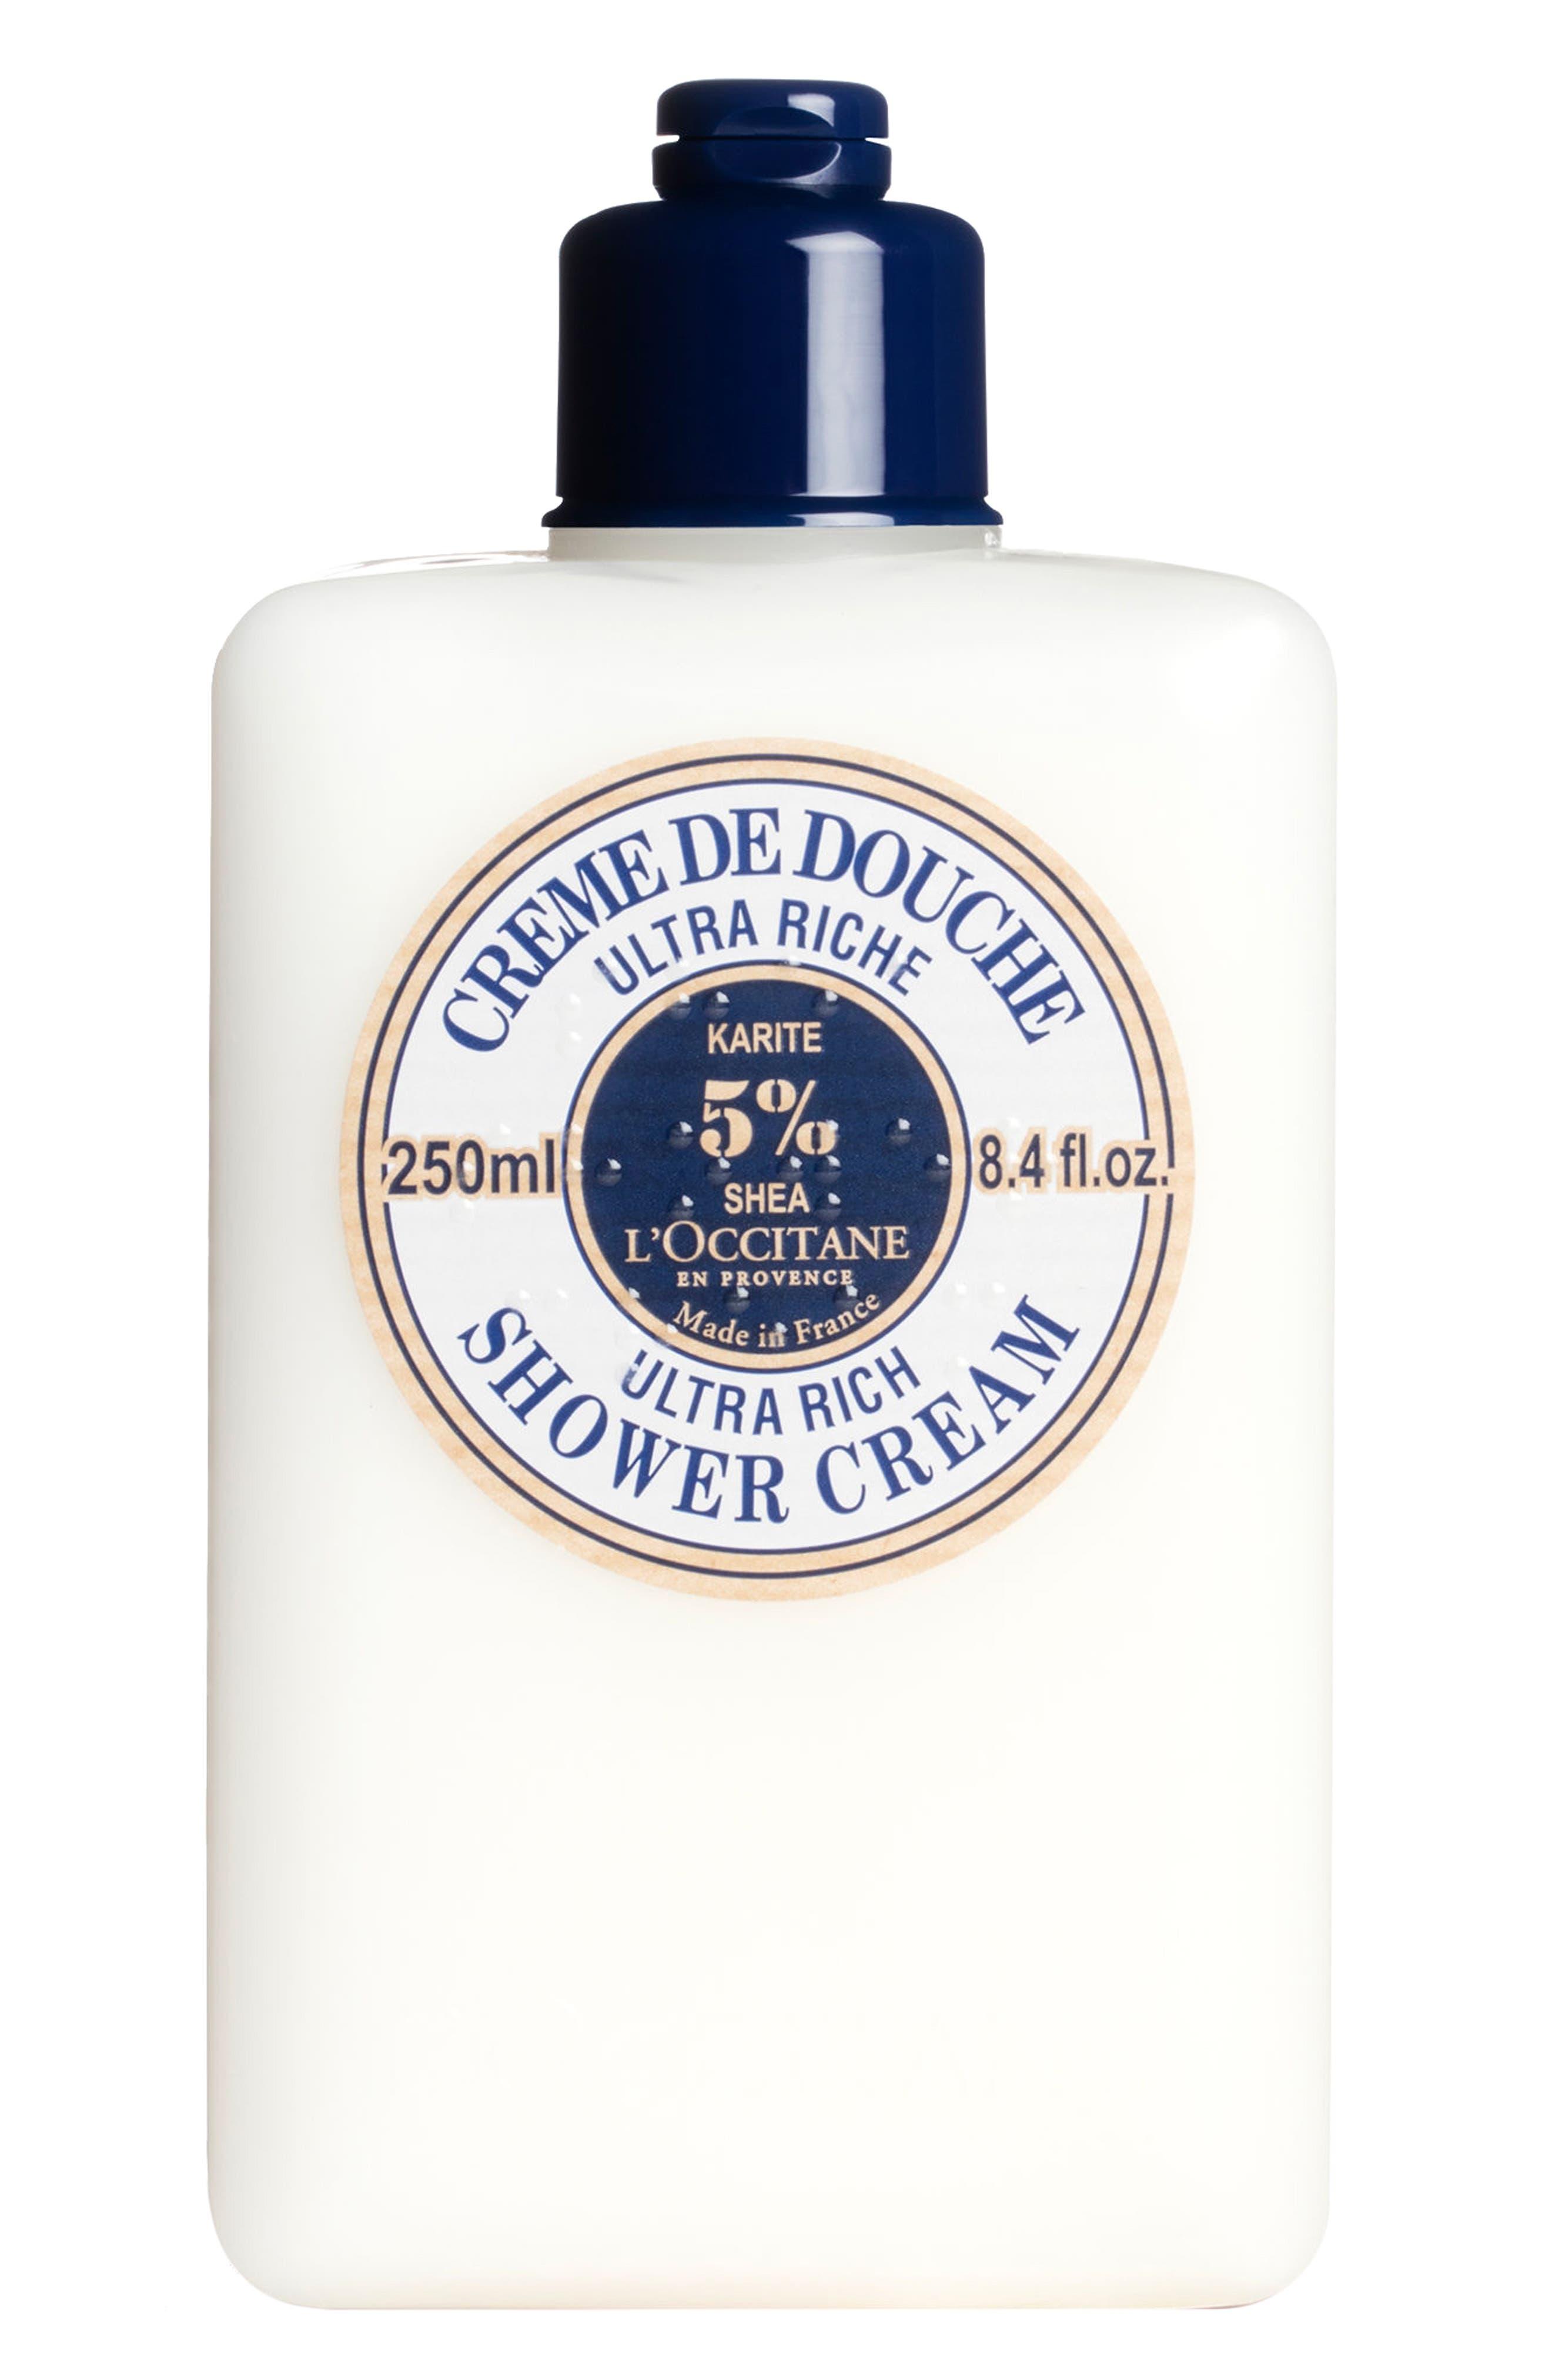 Ultra Rich Shower Cream | Nordstrom